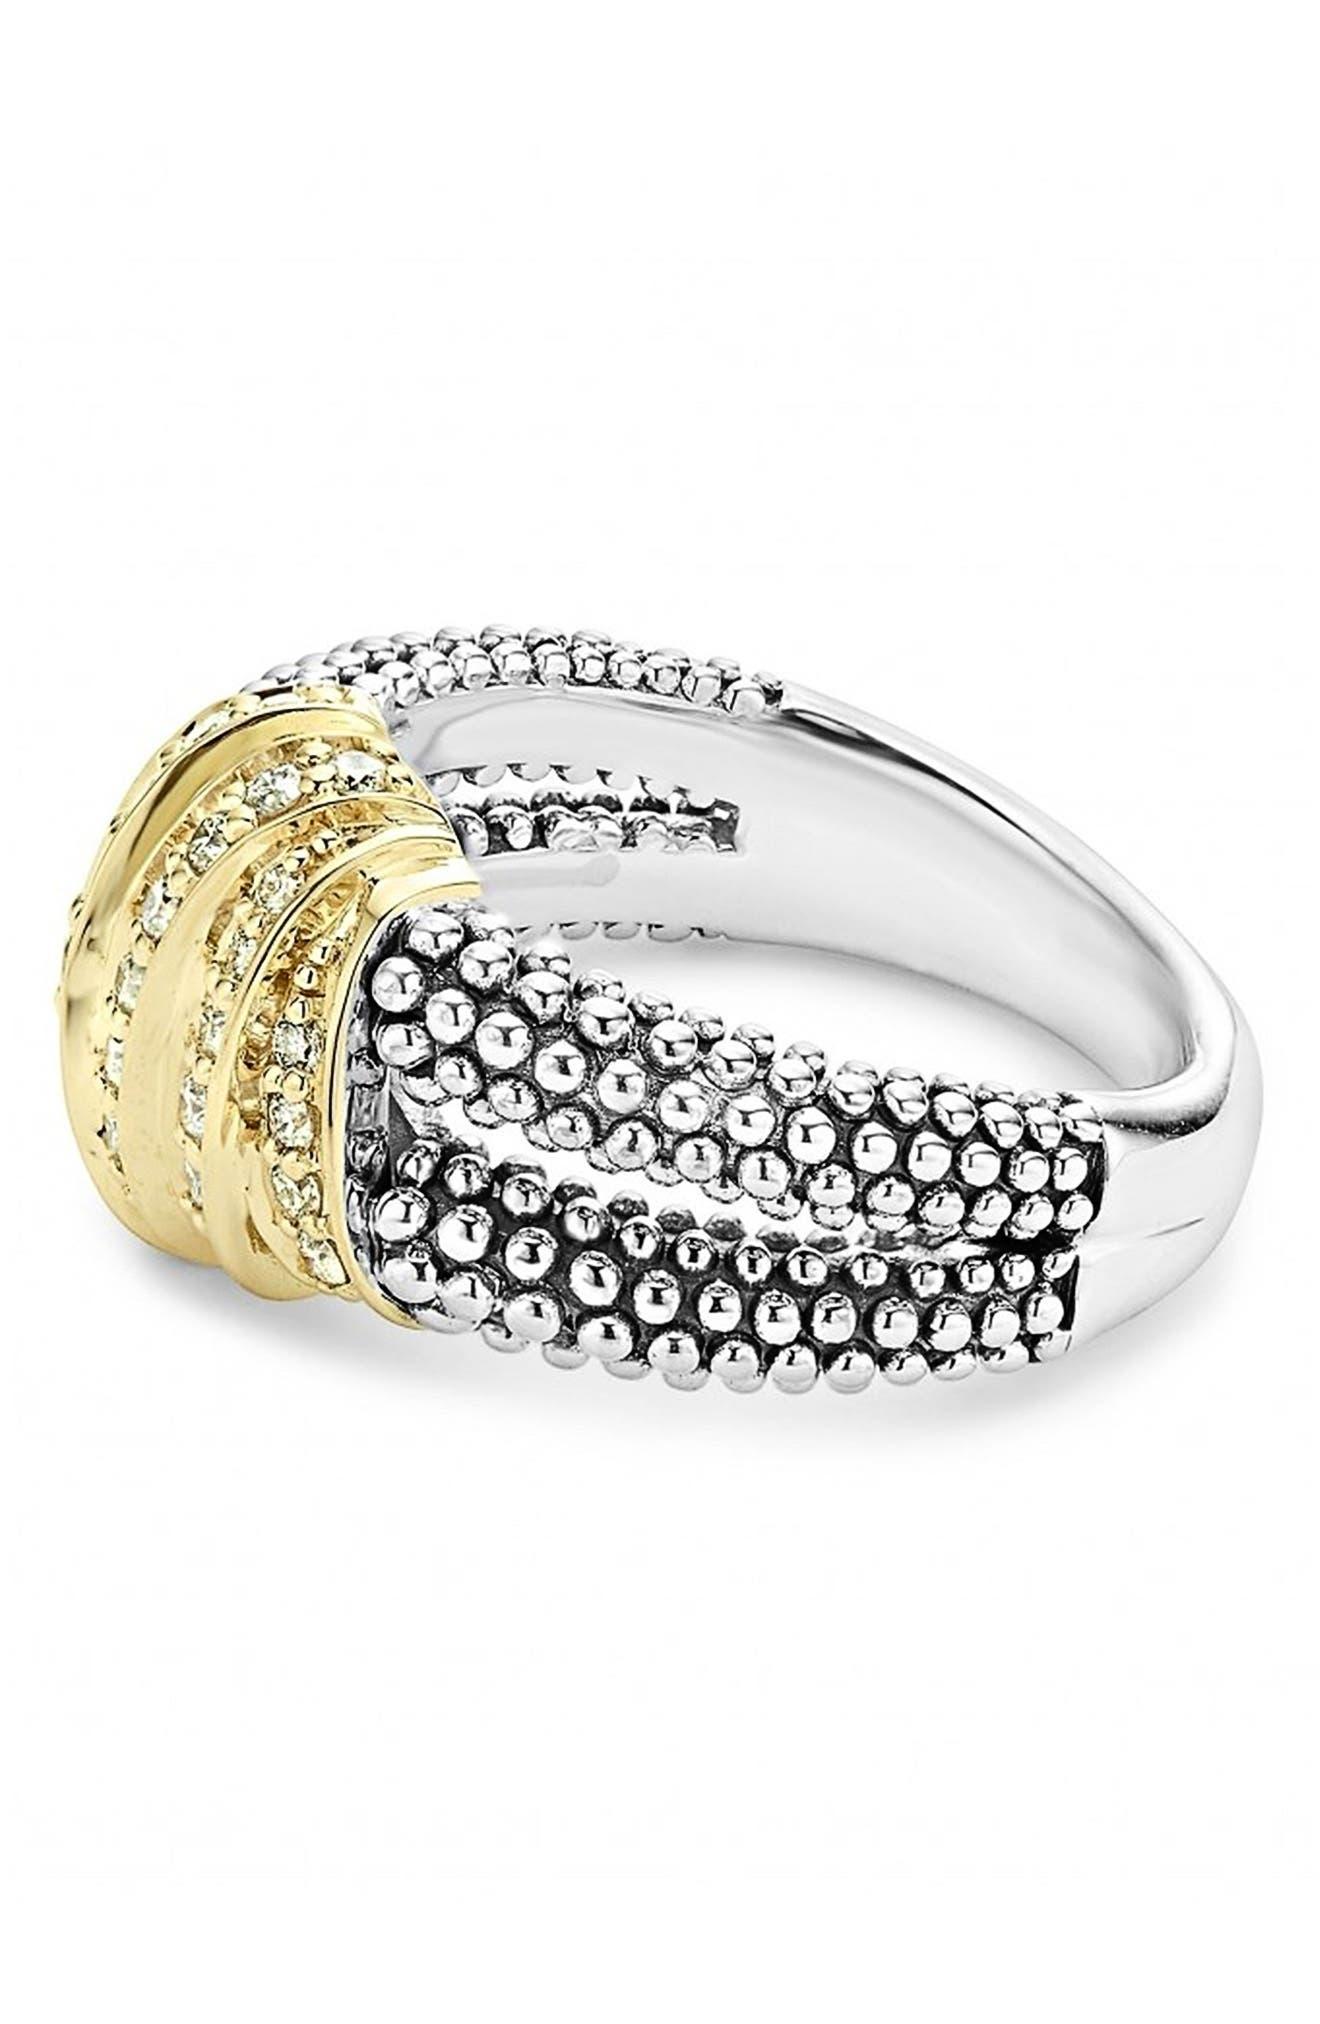 'Diamonds & Caviar' Medium Diamond Ring,                             Alternate thumbnail 2, color,                             Sterling Silver/ Gold